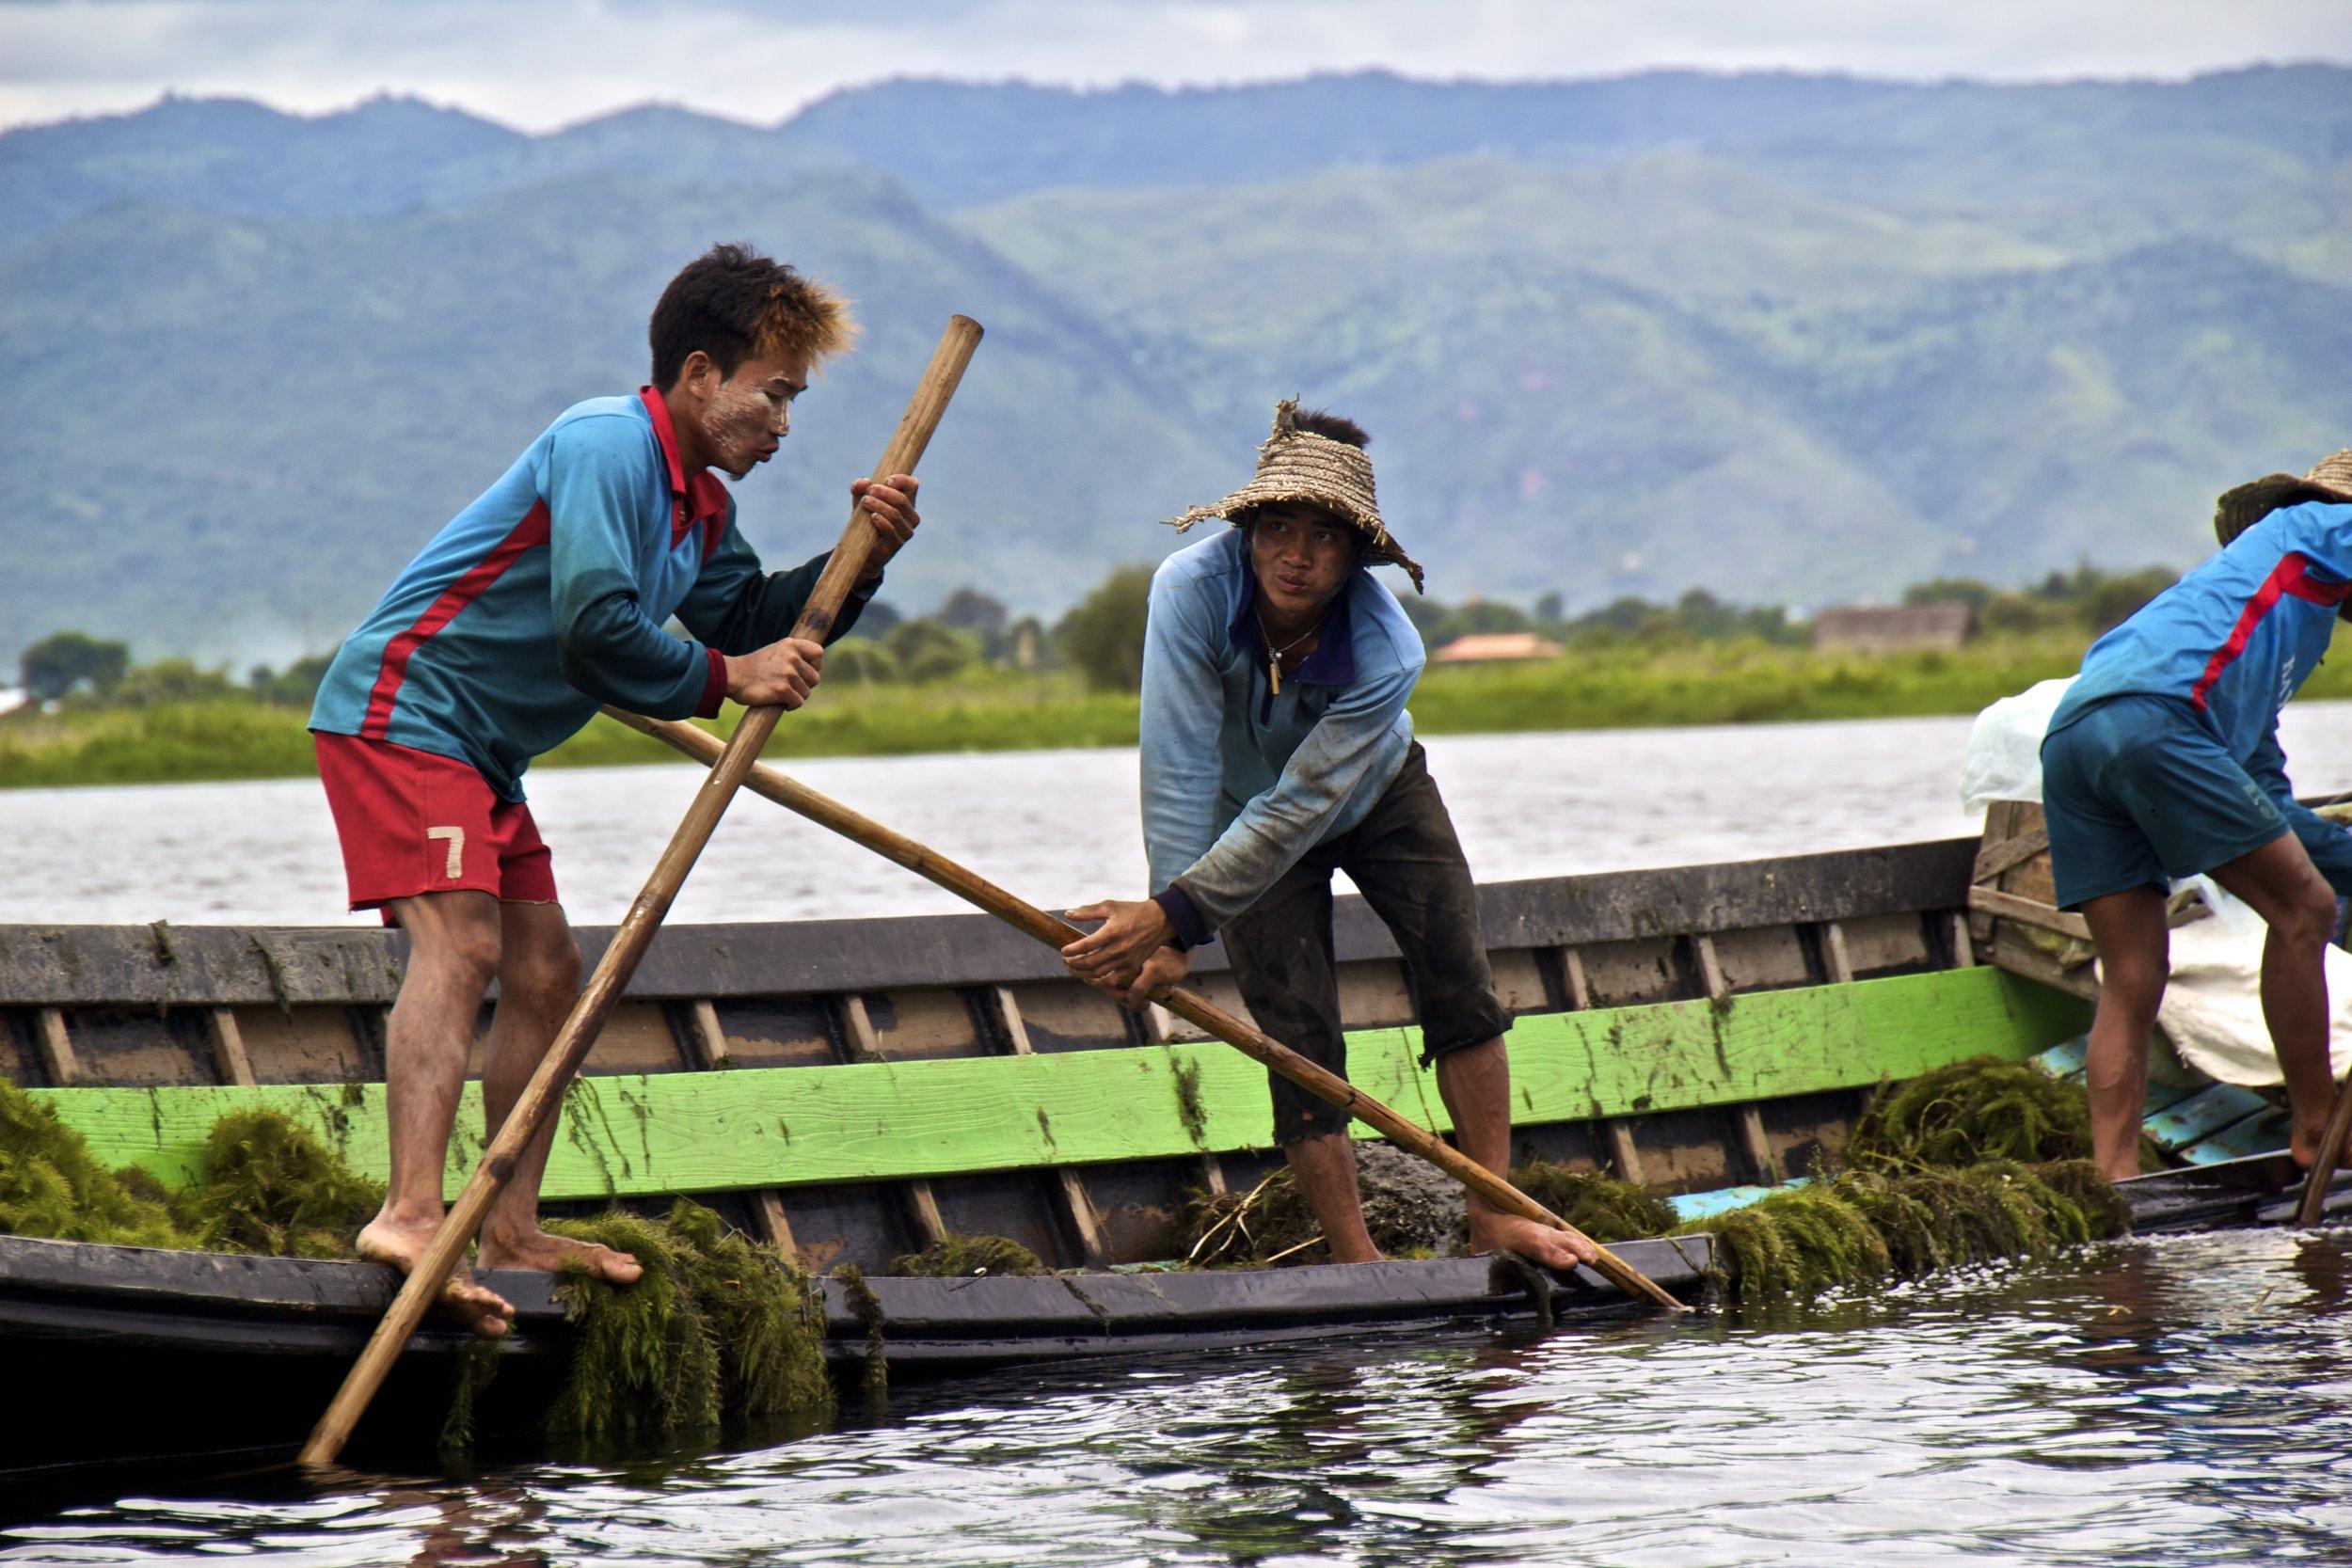 burma myanmar inle lake shan state 11.jpg